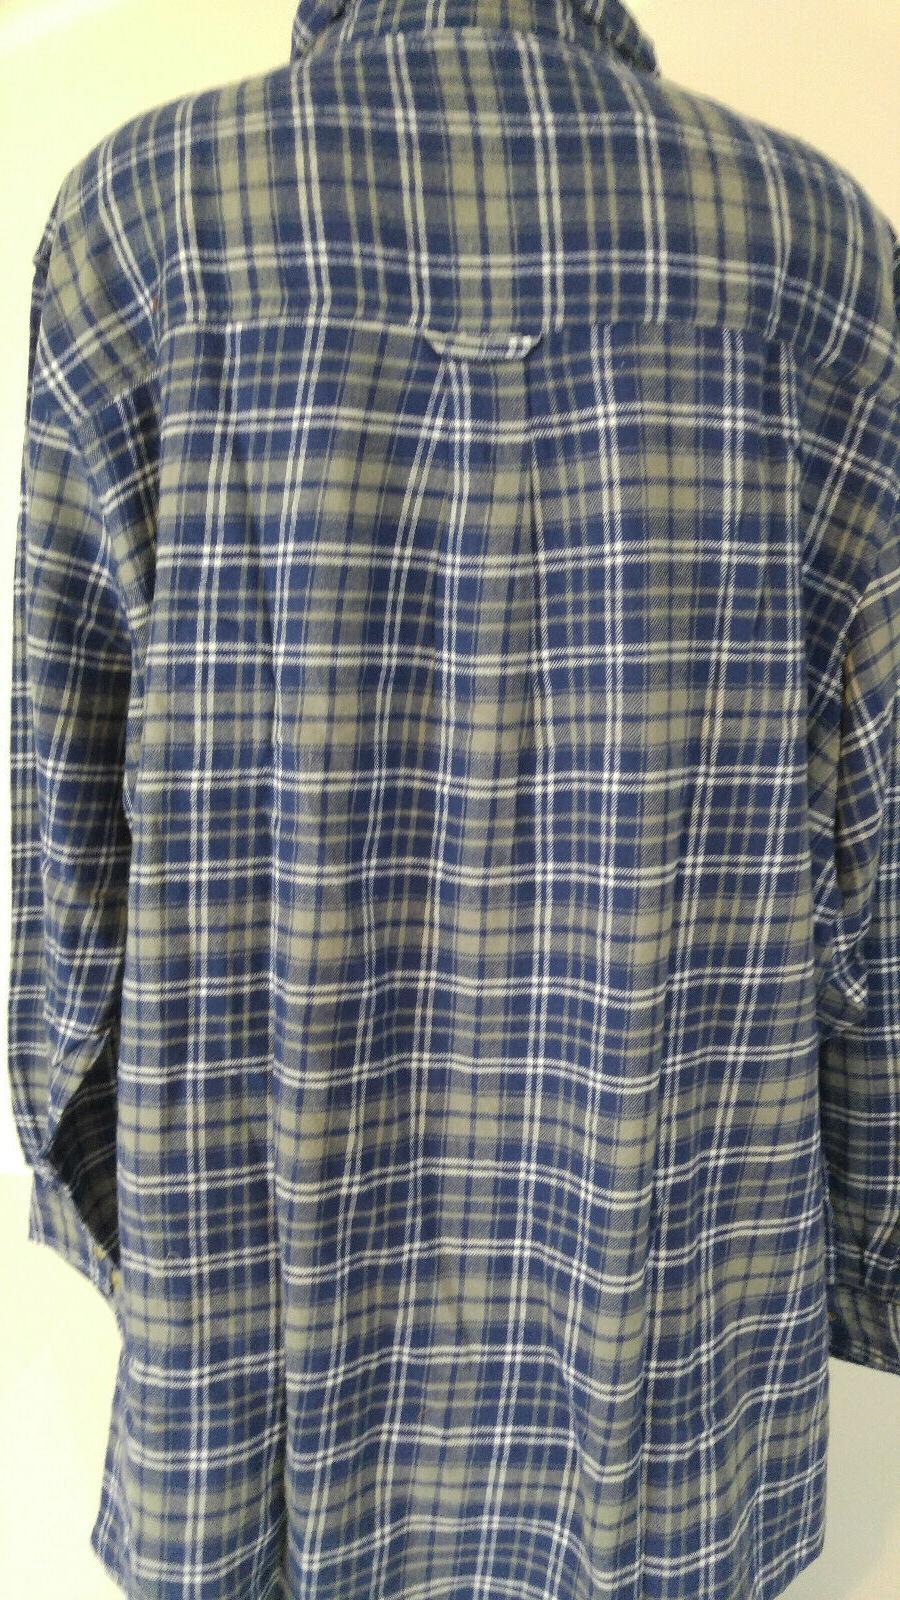 King Tall Flannel Shirt Blue Gray